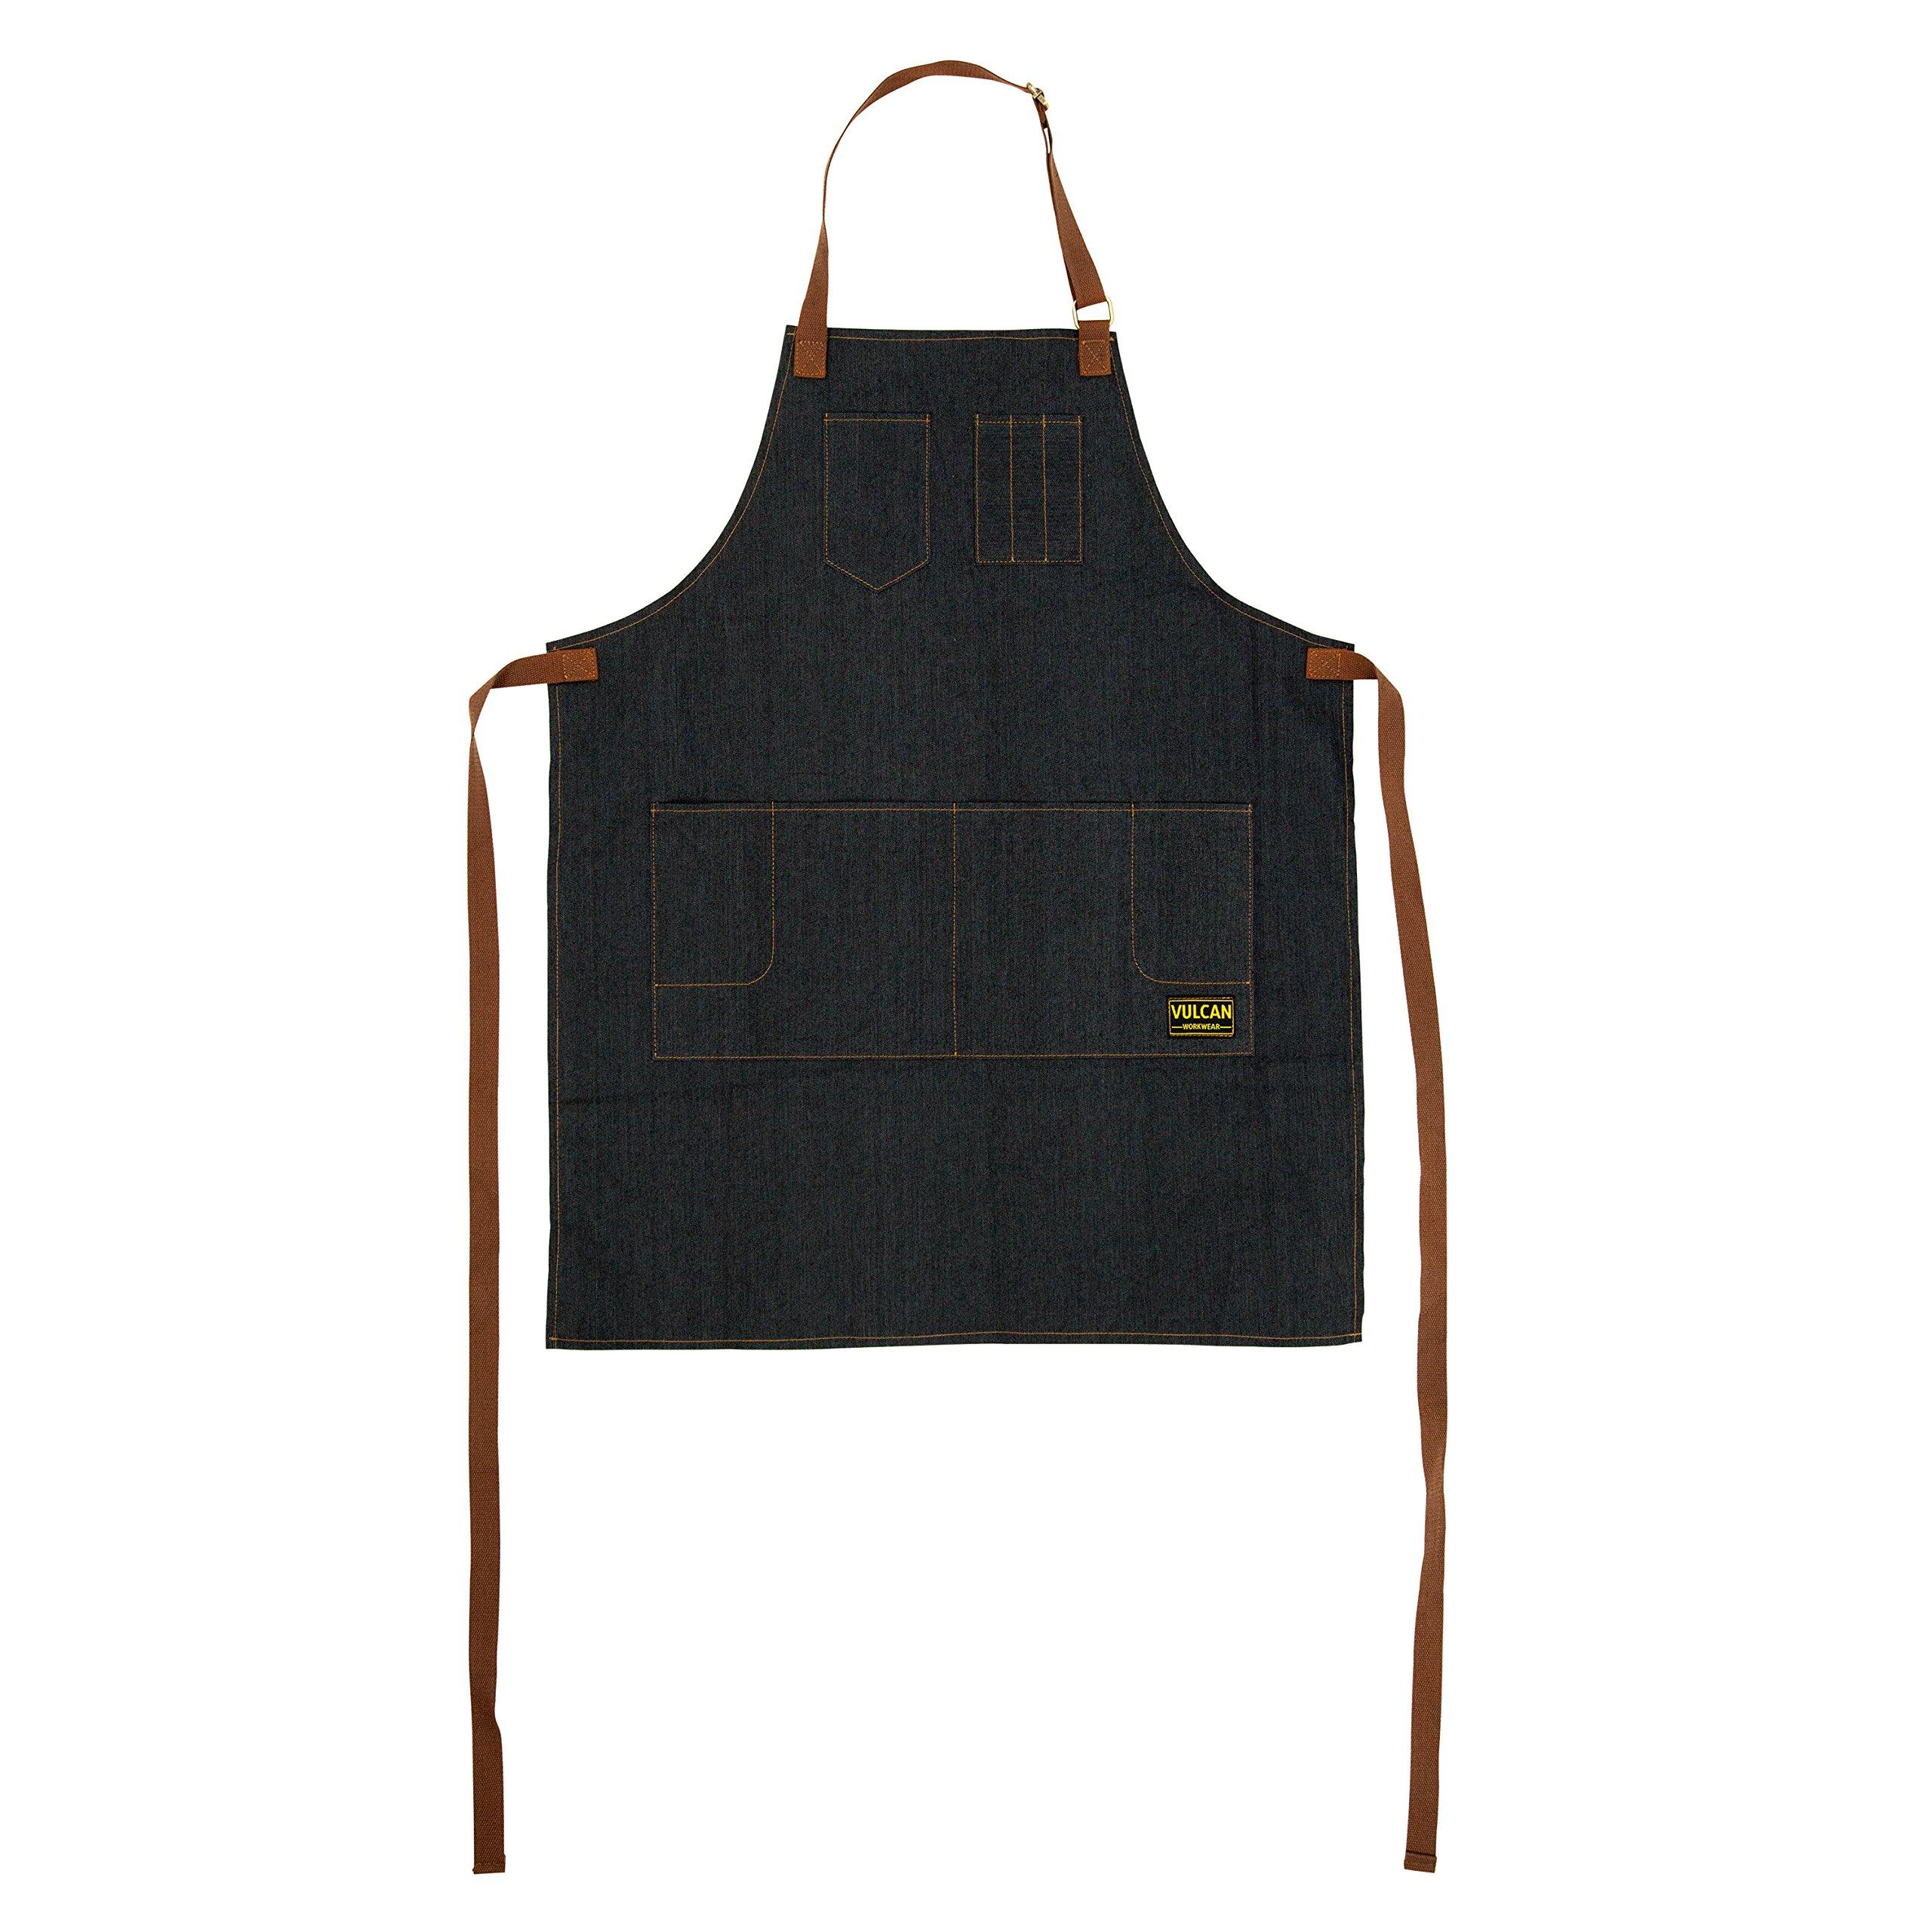 Vulcan Workwear Utility Apron - Multi-Use Shop Apron with Pockets - Lightweight Denim Tool Apron by Vulcan Workwear (Image #2)